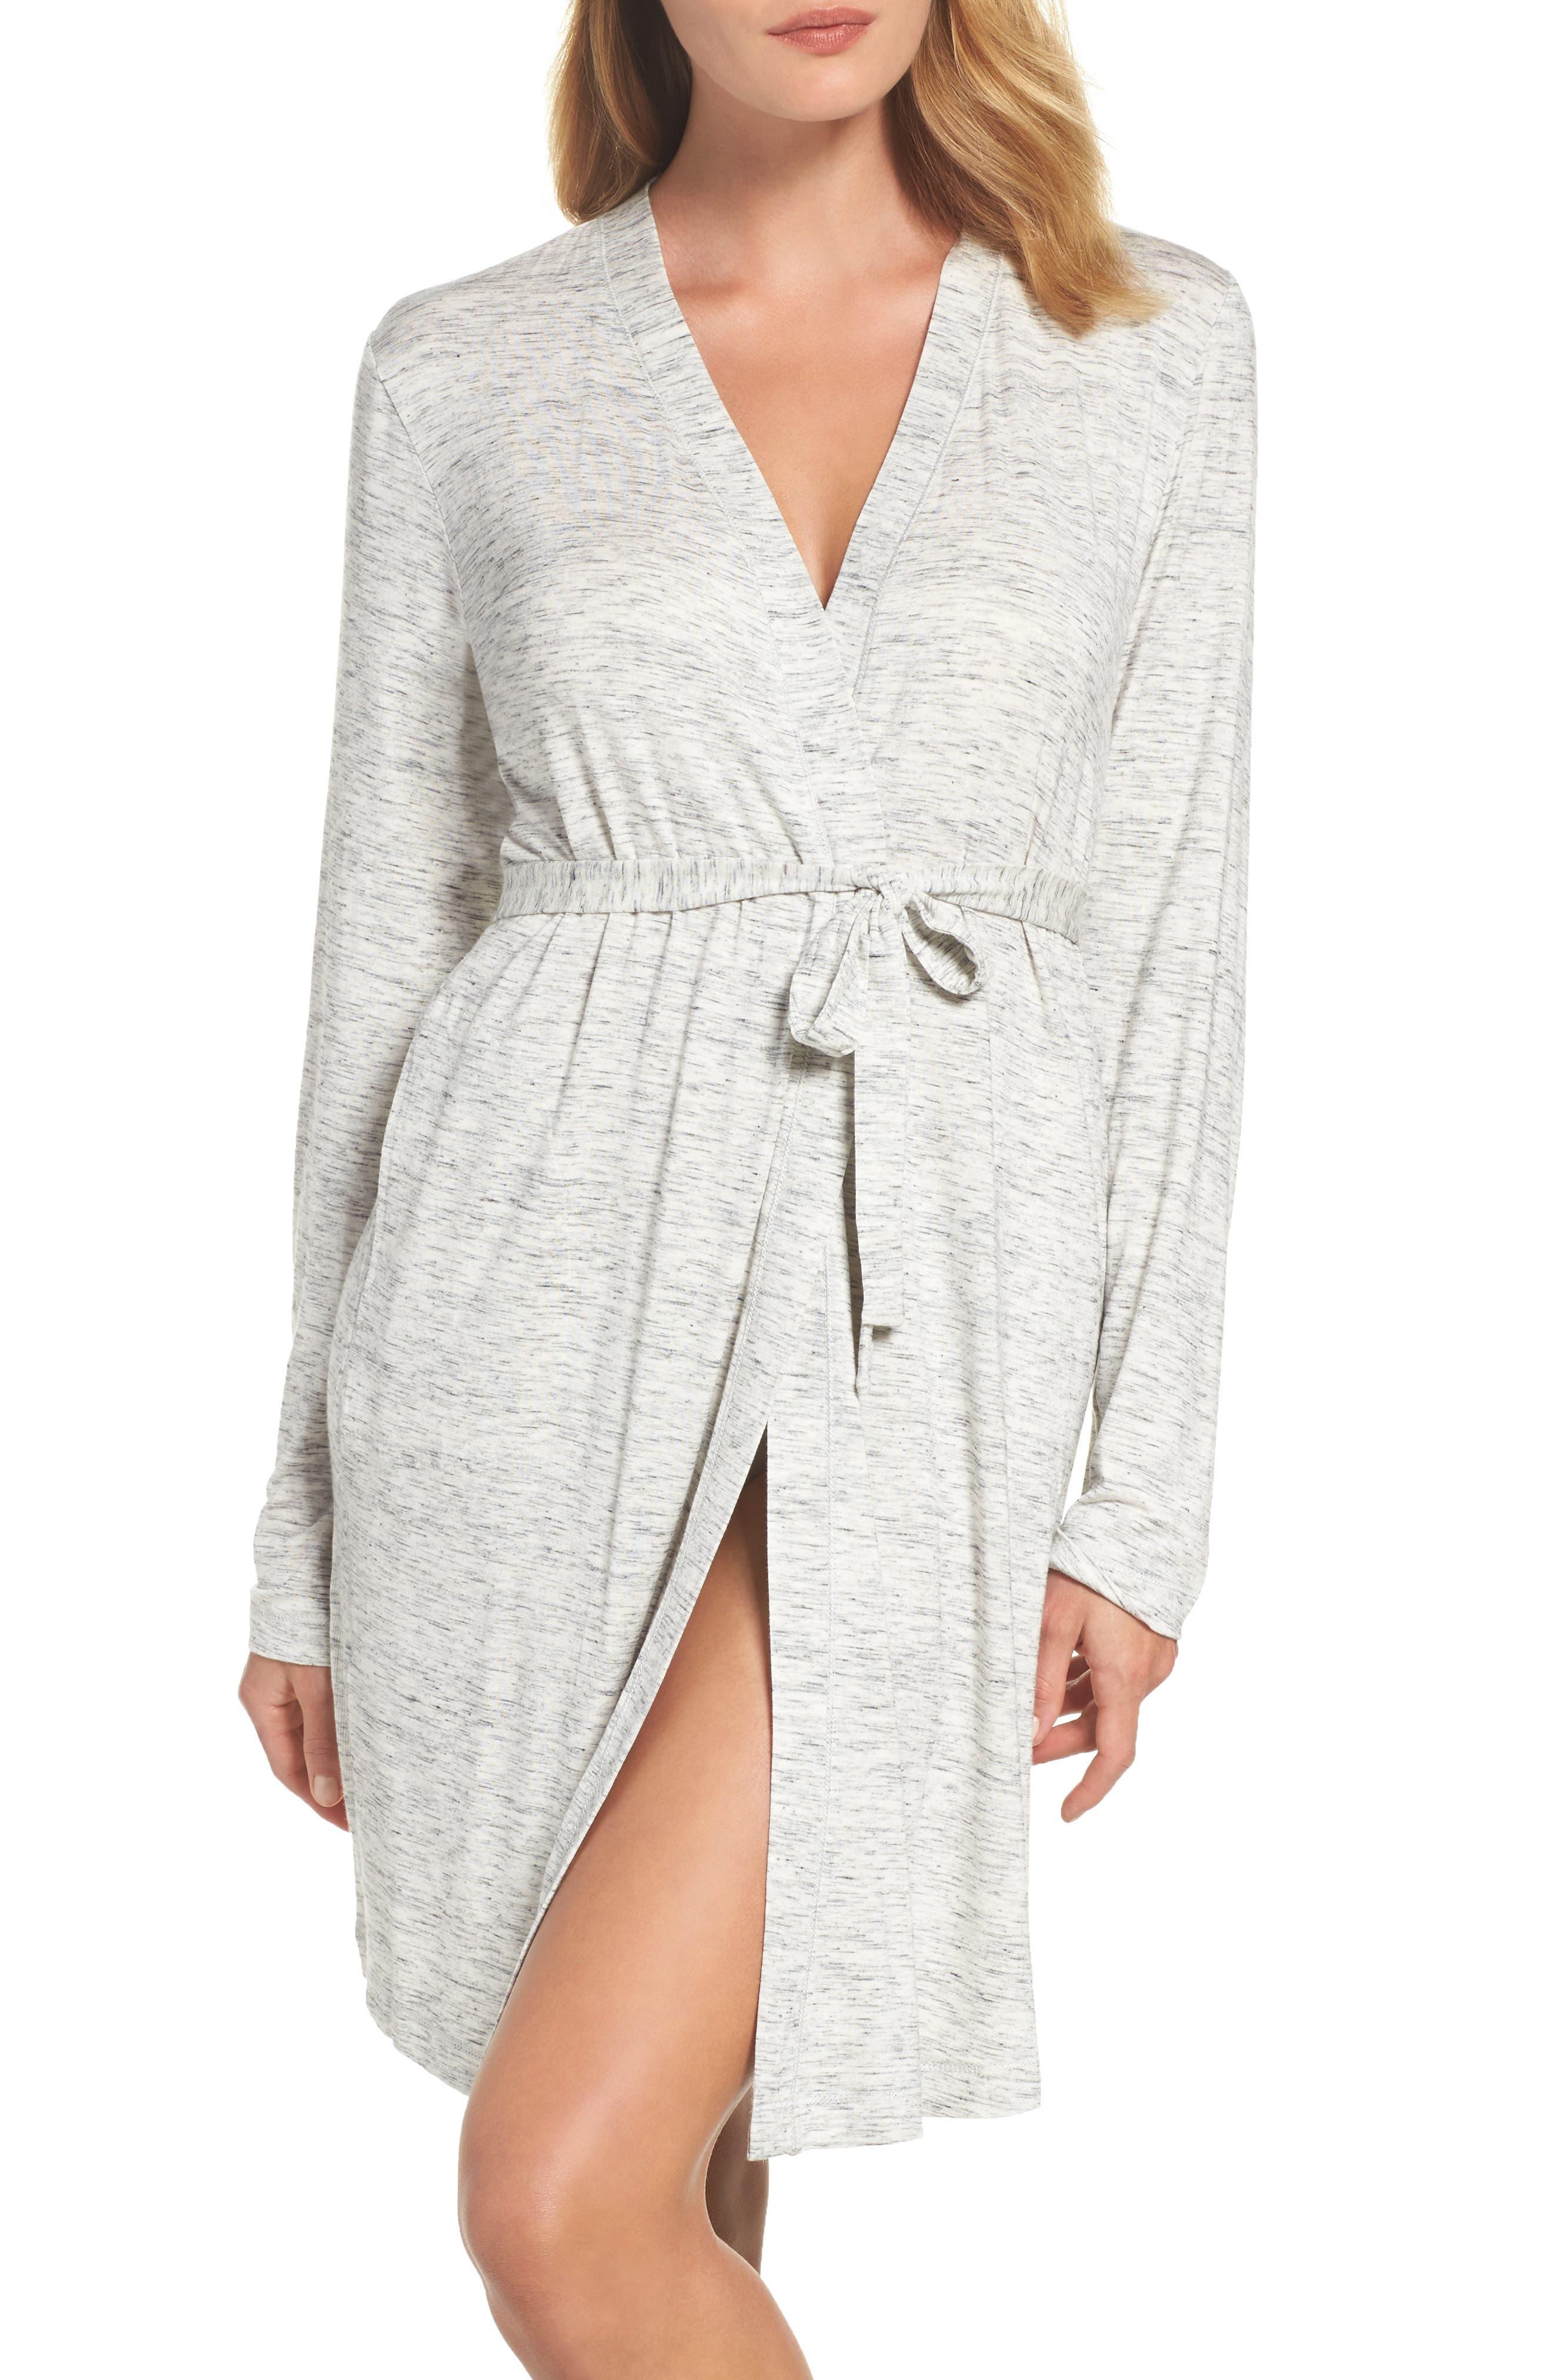 DKNY 'City Essentials' Short Robe